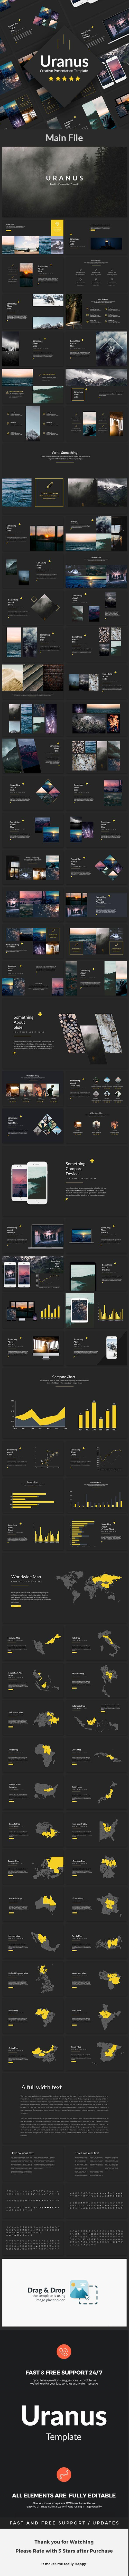 Uranus - Creative Powerpoint Template